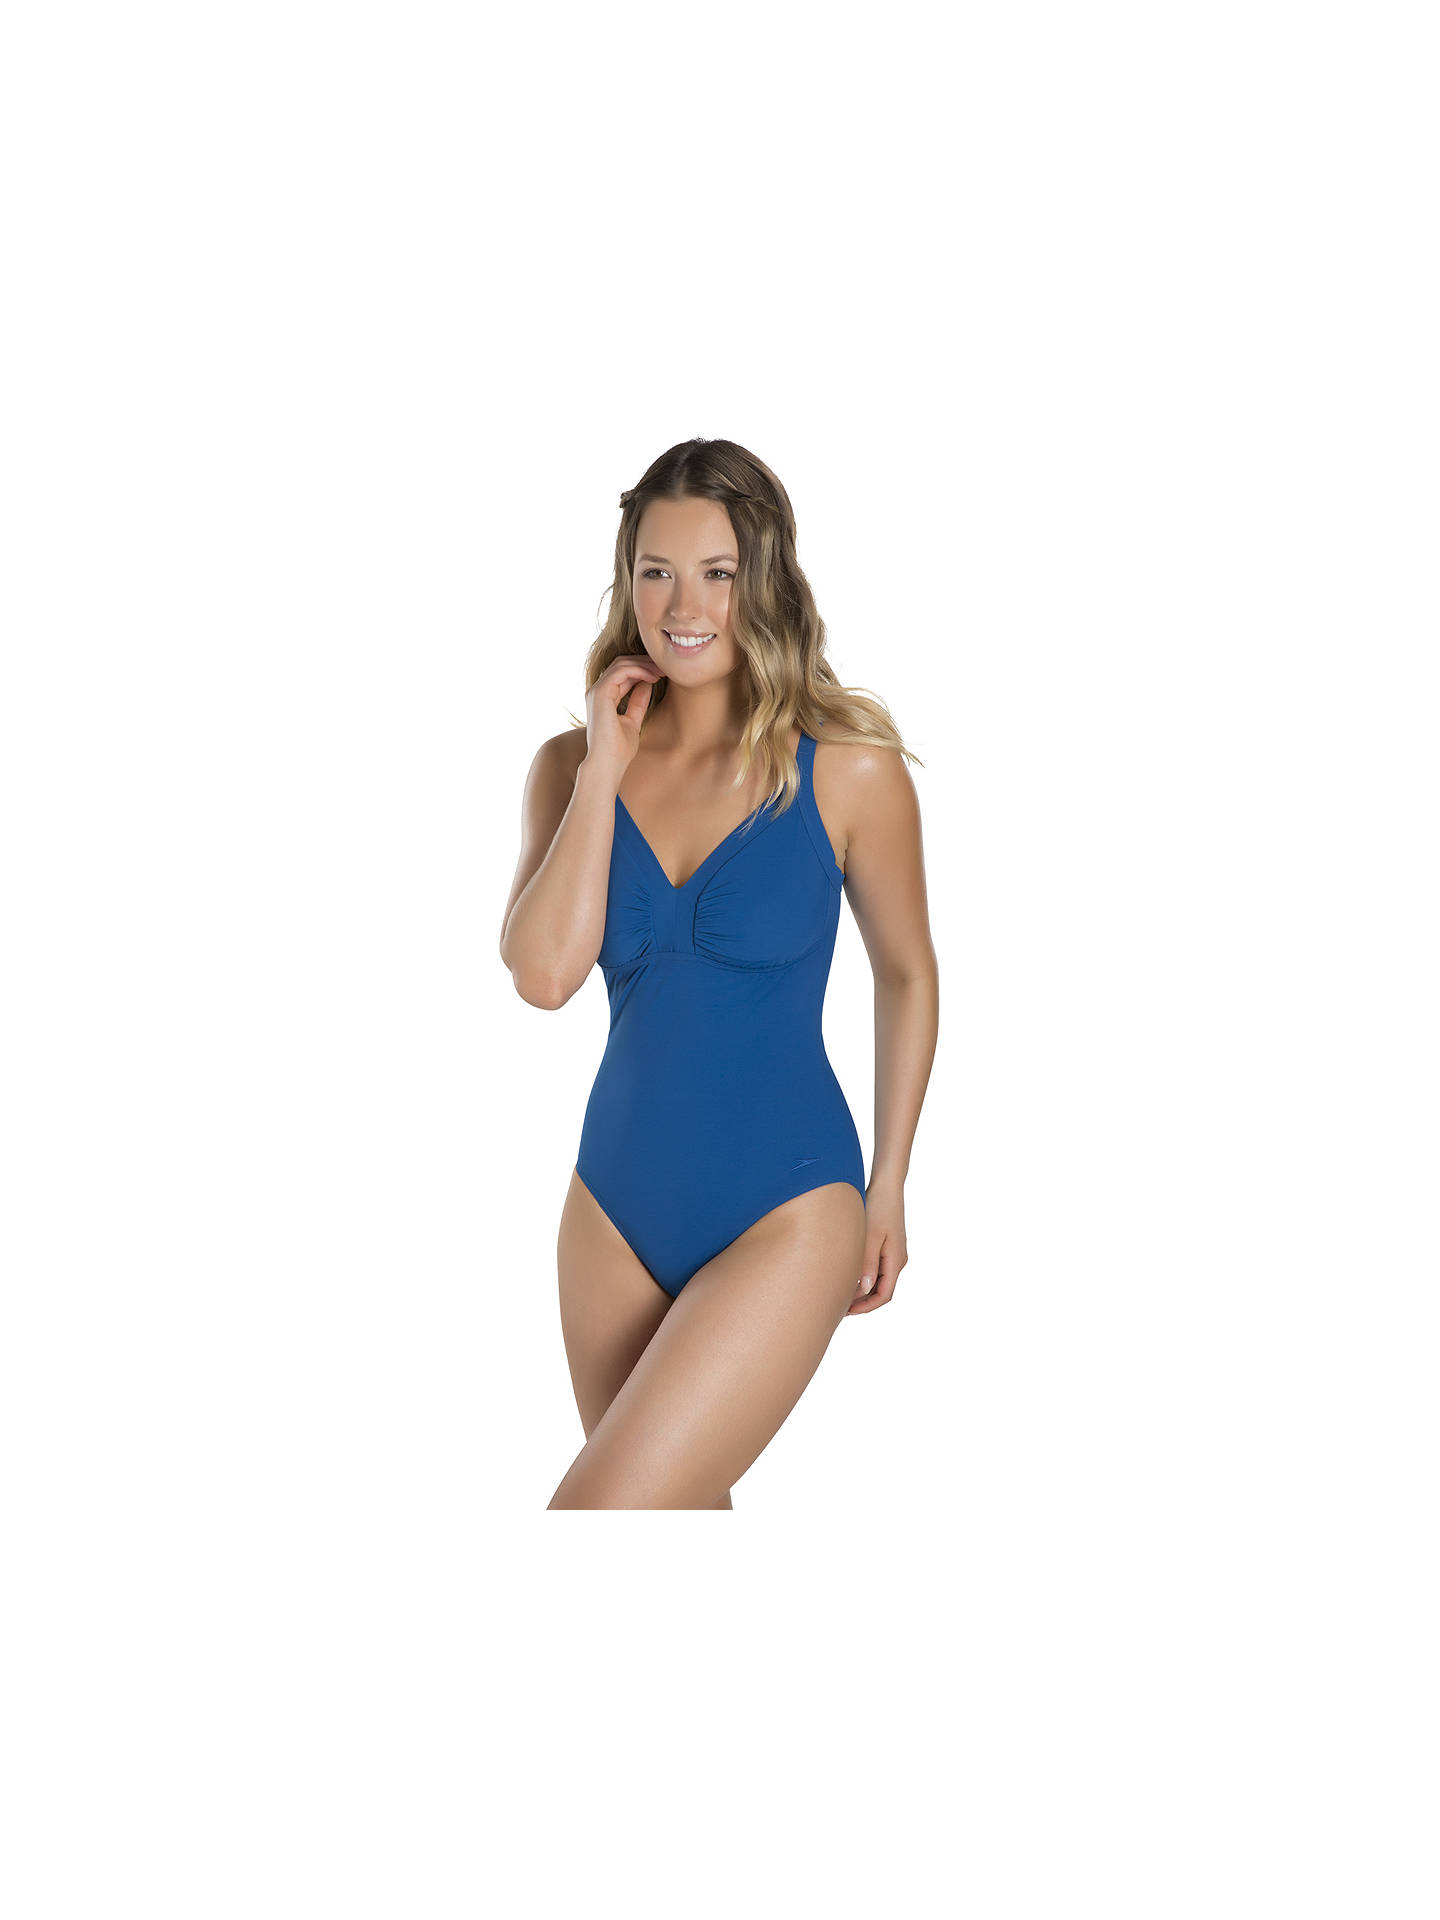 f2ed59bcee ... Buy Speedo Sculpture Watergem Swimsuit, Navy, 32 Online at  johnlewis.com ...